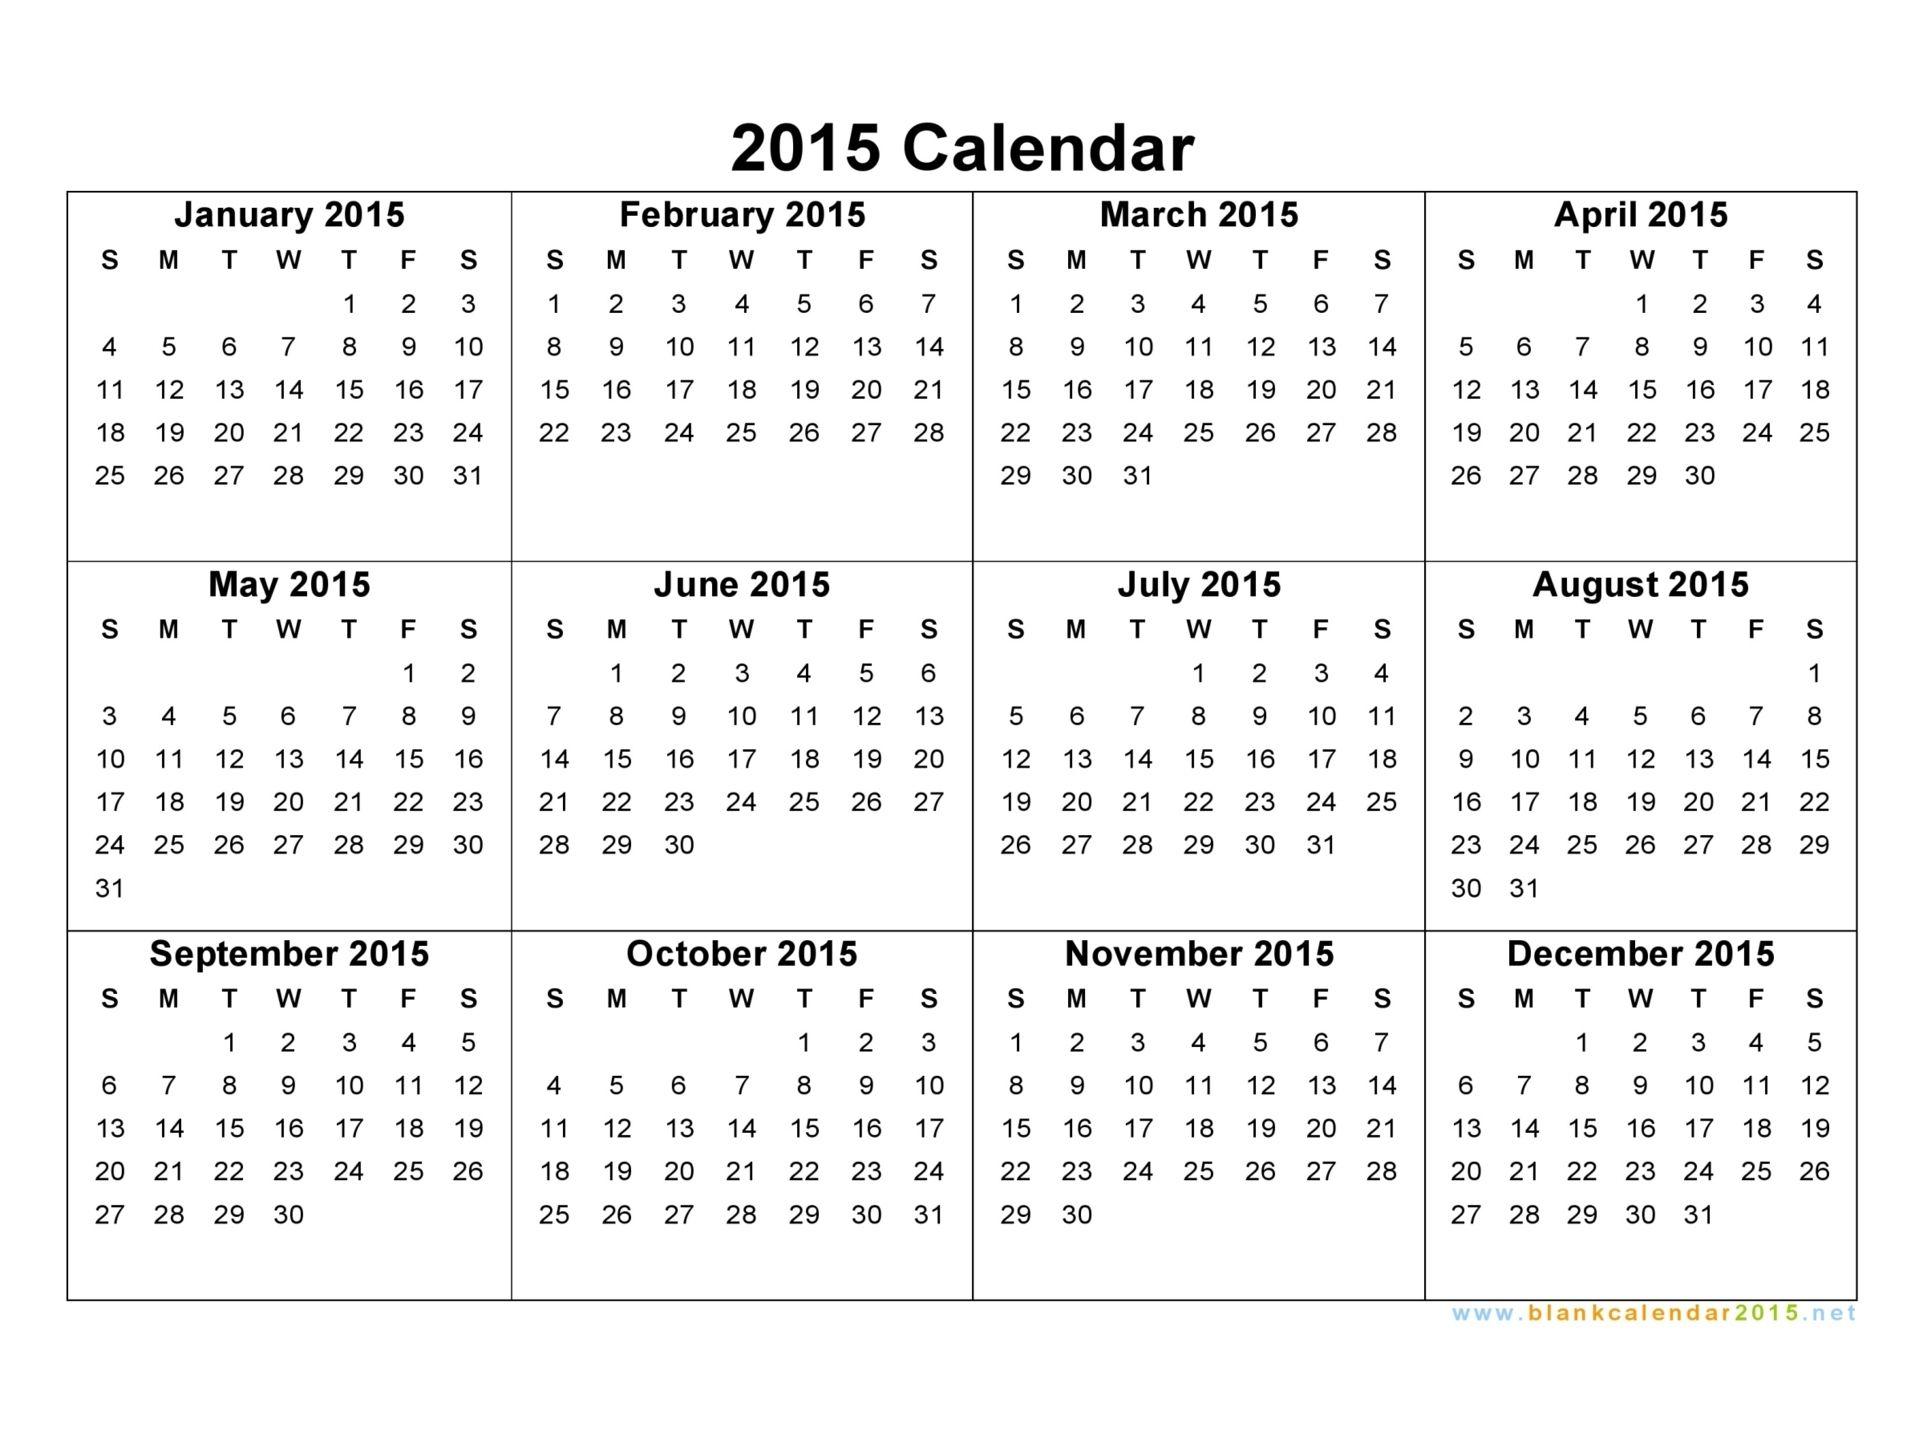 Blank Calendar Bing Images Blank Monthly Calendar Template Monthly Calendar Template Calendar Template